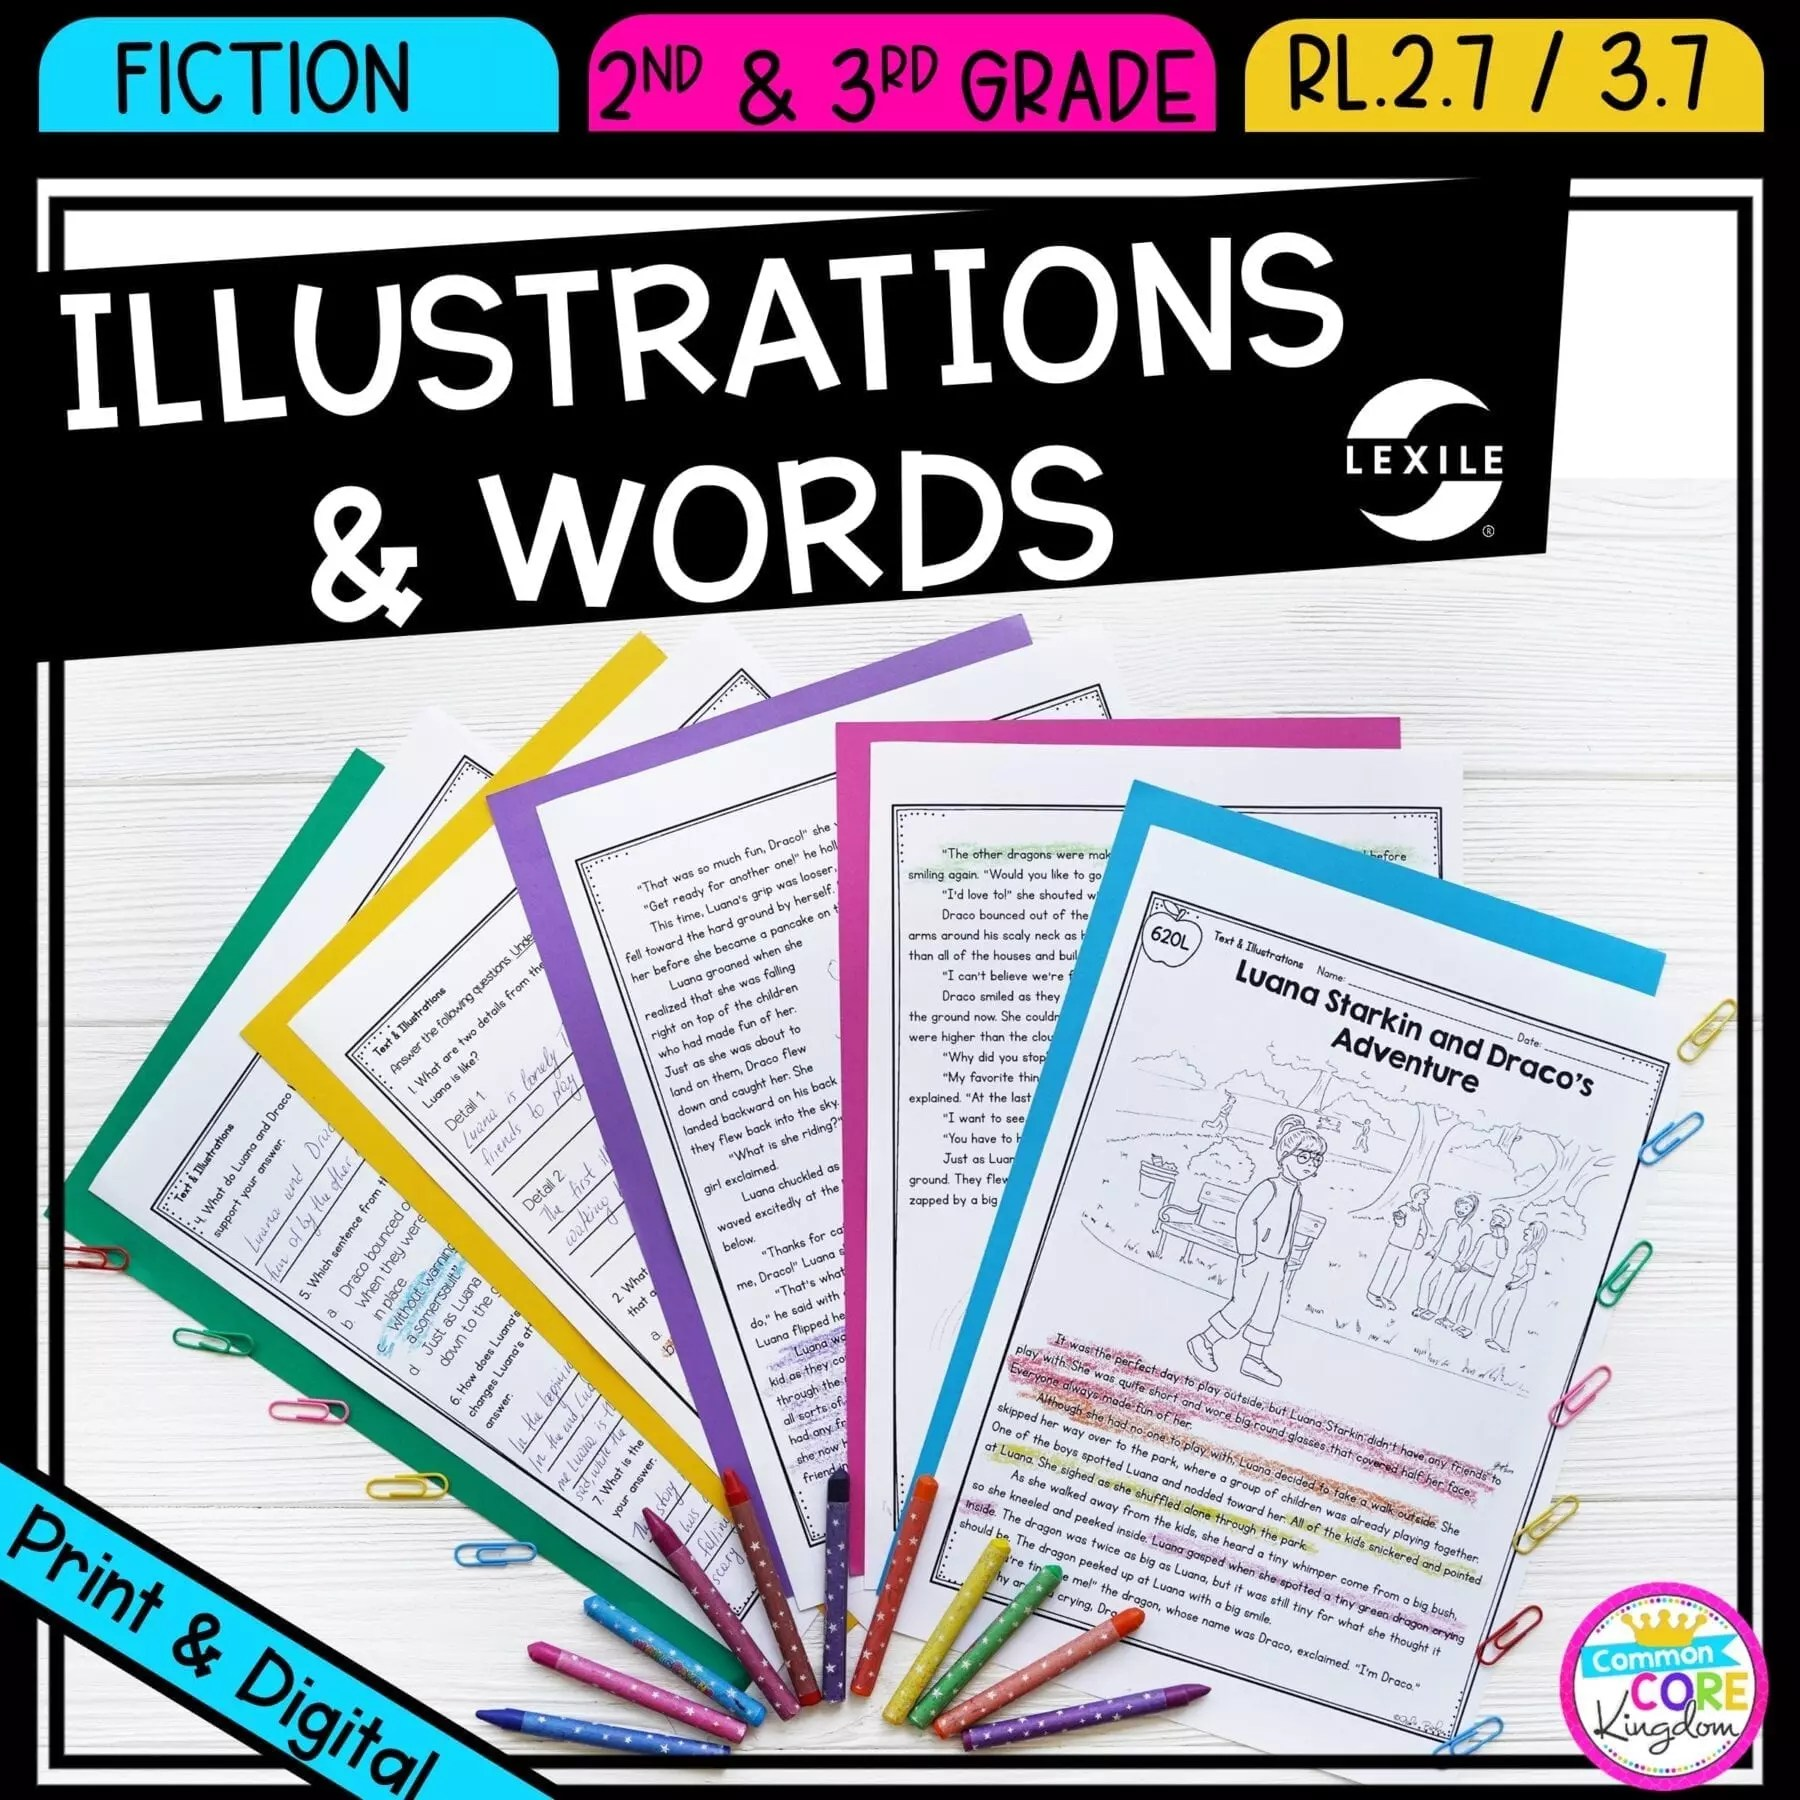 medium resolution of Illustrations \u0026 Words RL.2.7 RL.3.7   Common Core Kingdom